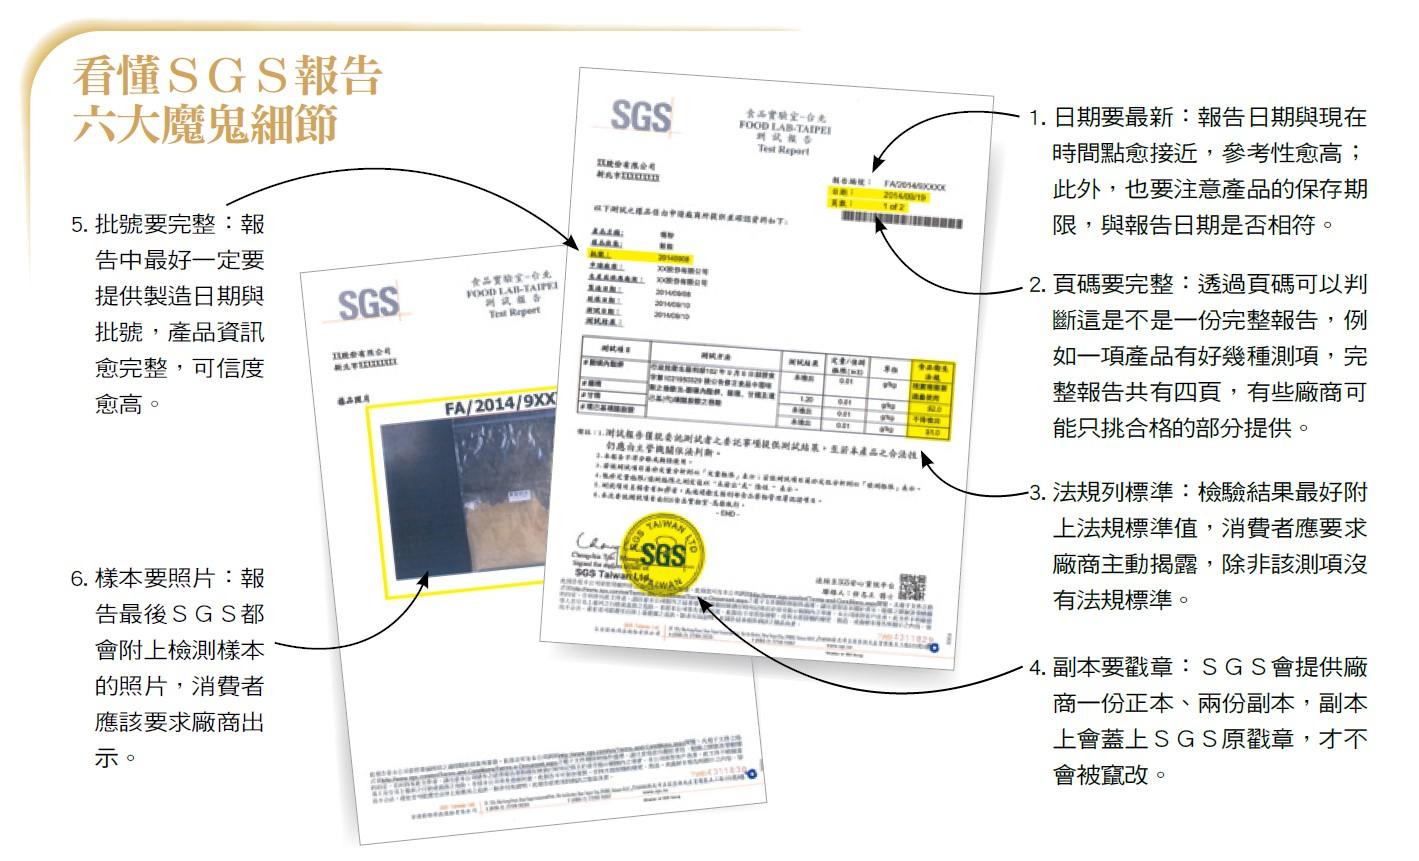 SGS報告六大魔鬼細節